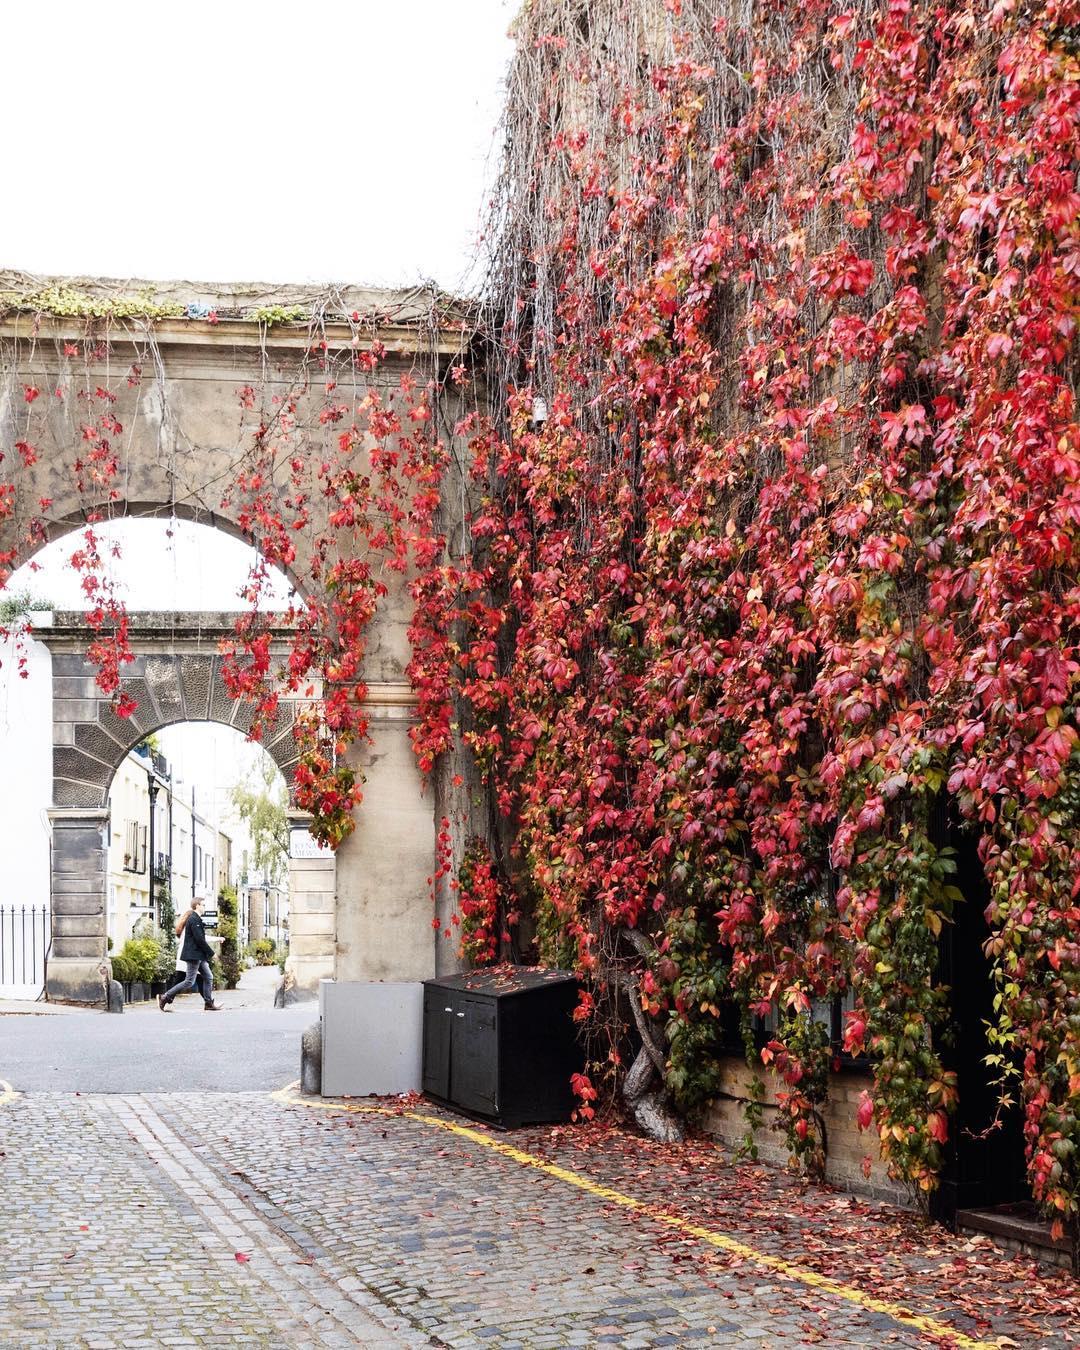 London autumn photograph, sparrowinlondon mews